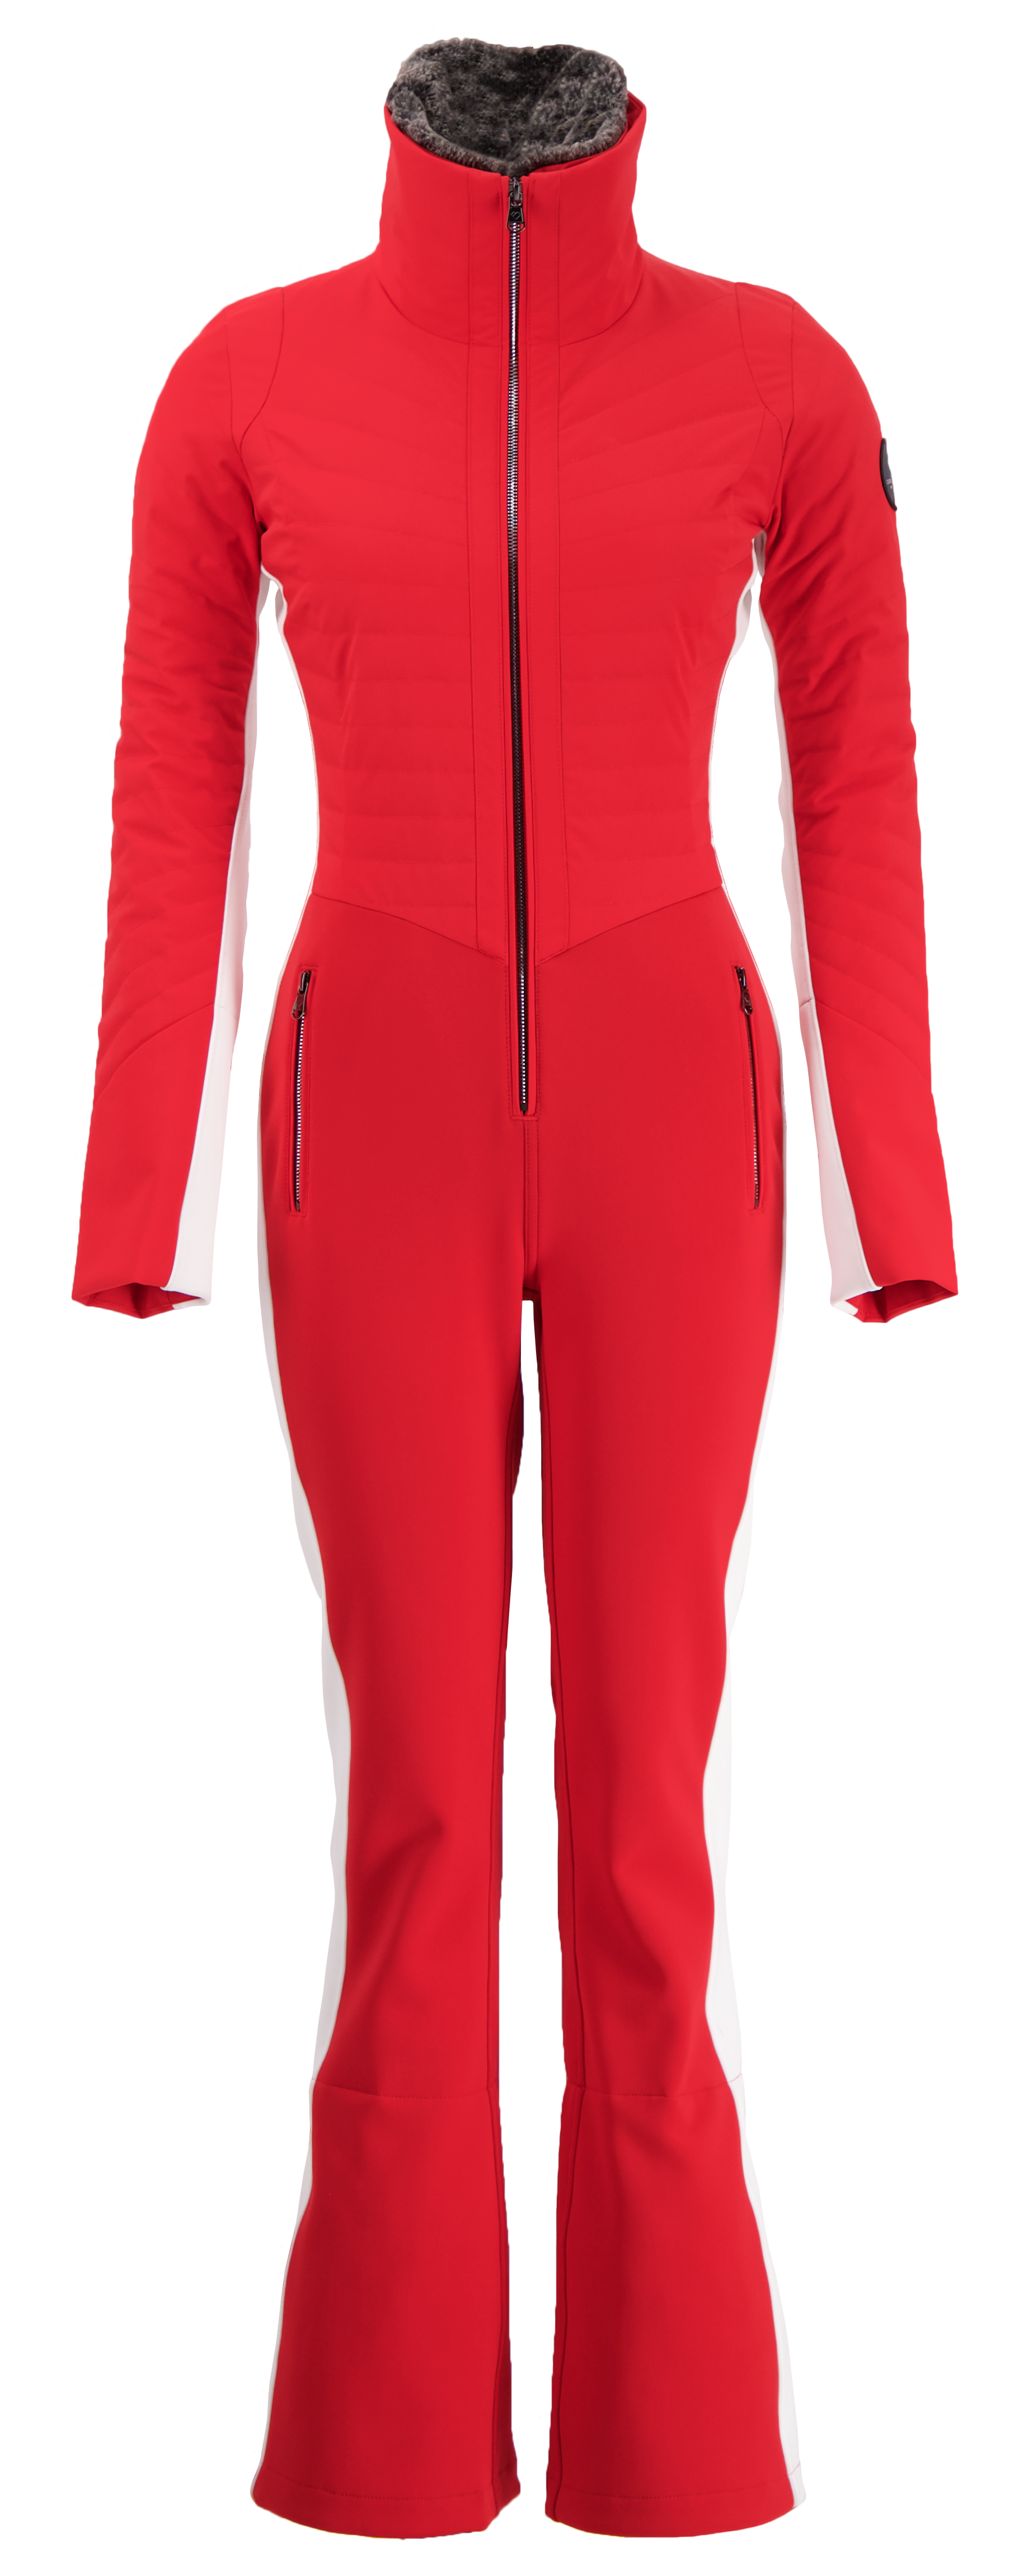 SKI Tester Renee Geery models the Helly Hansen Whitewall LifaLoft Jacket